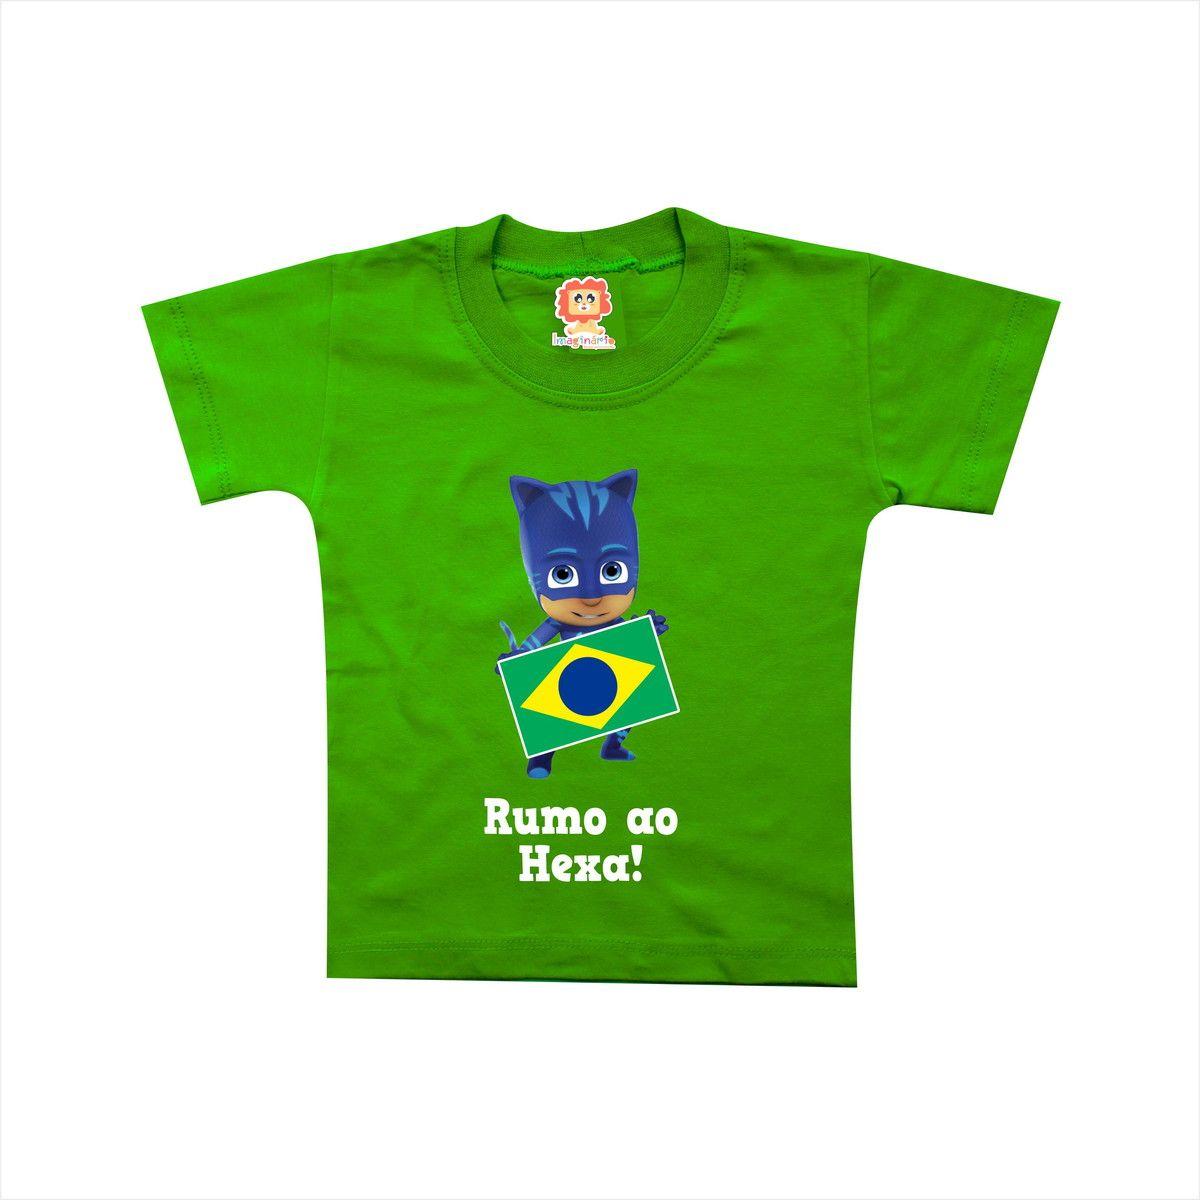 Body ou Camiseta PJ Masks Menino Gato Copa do Mundo Brasil